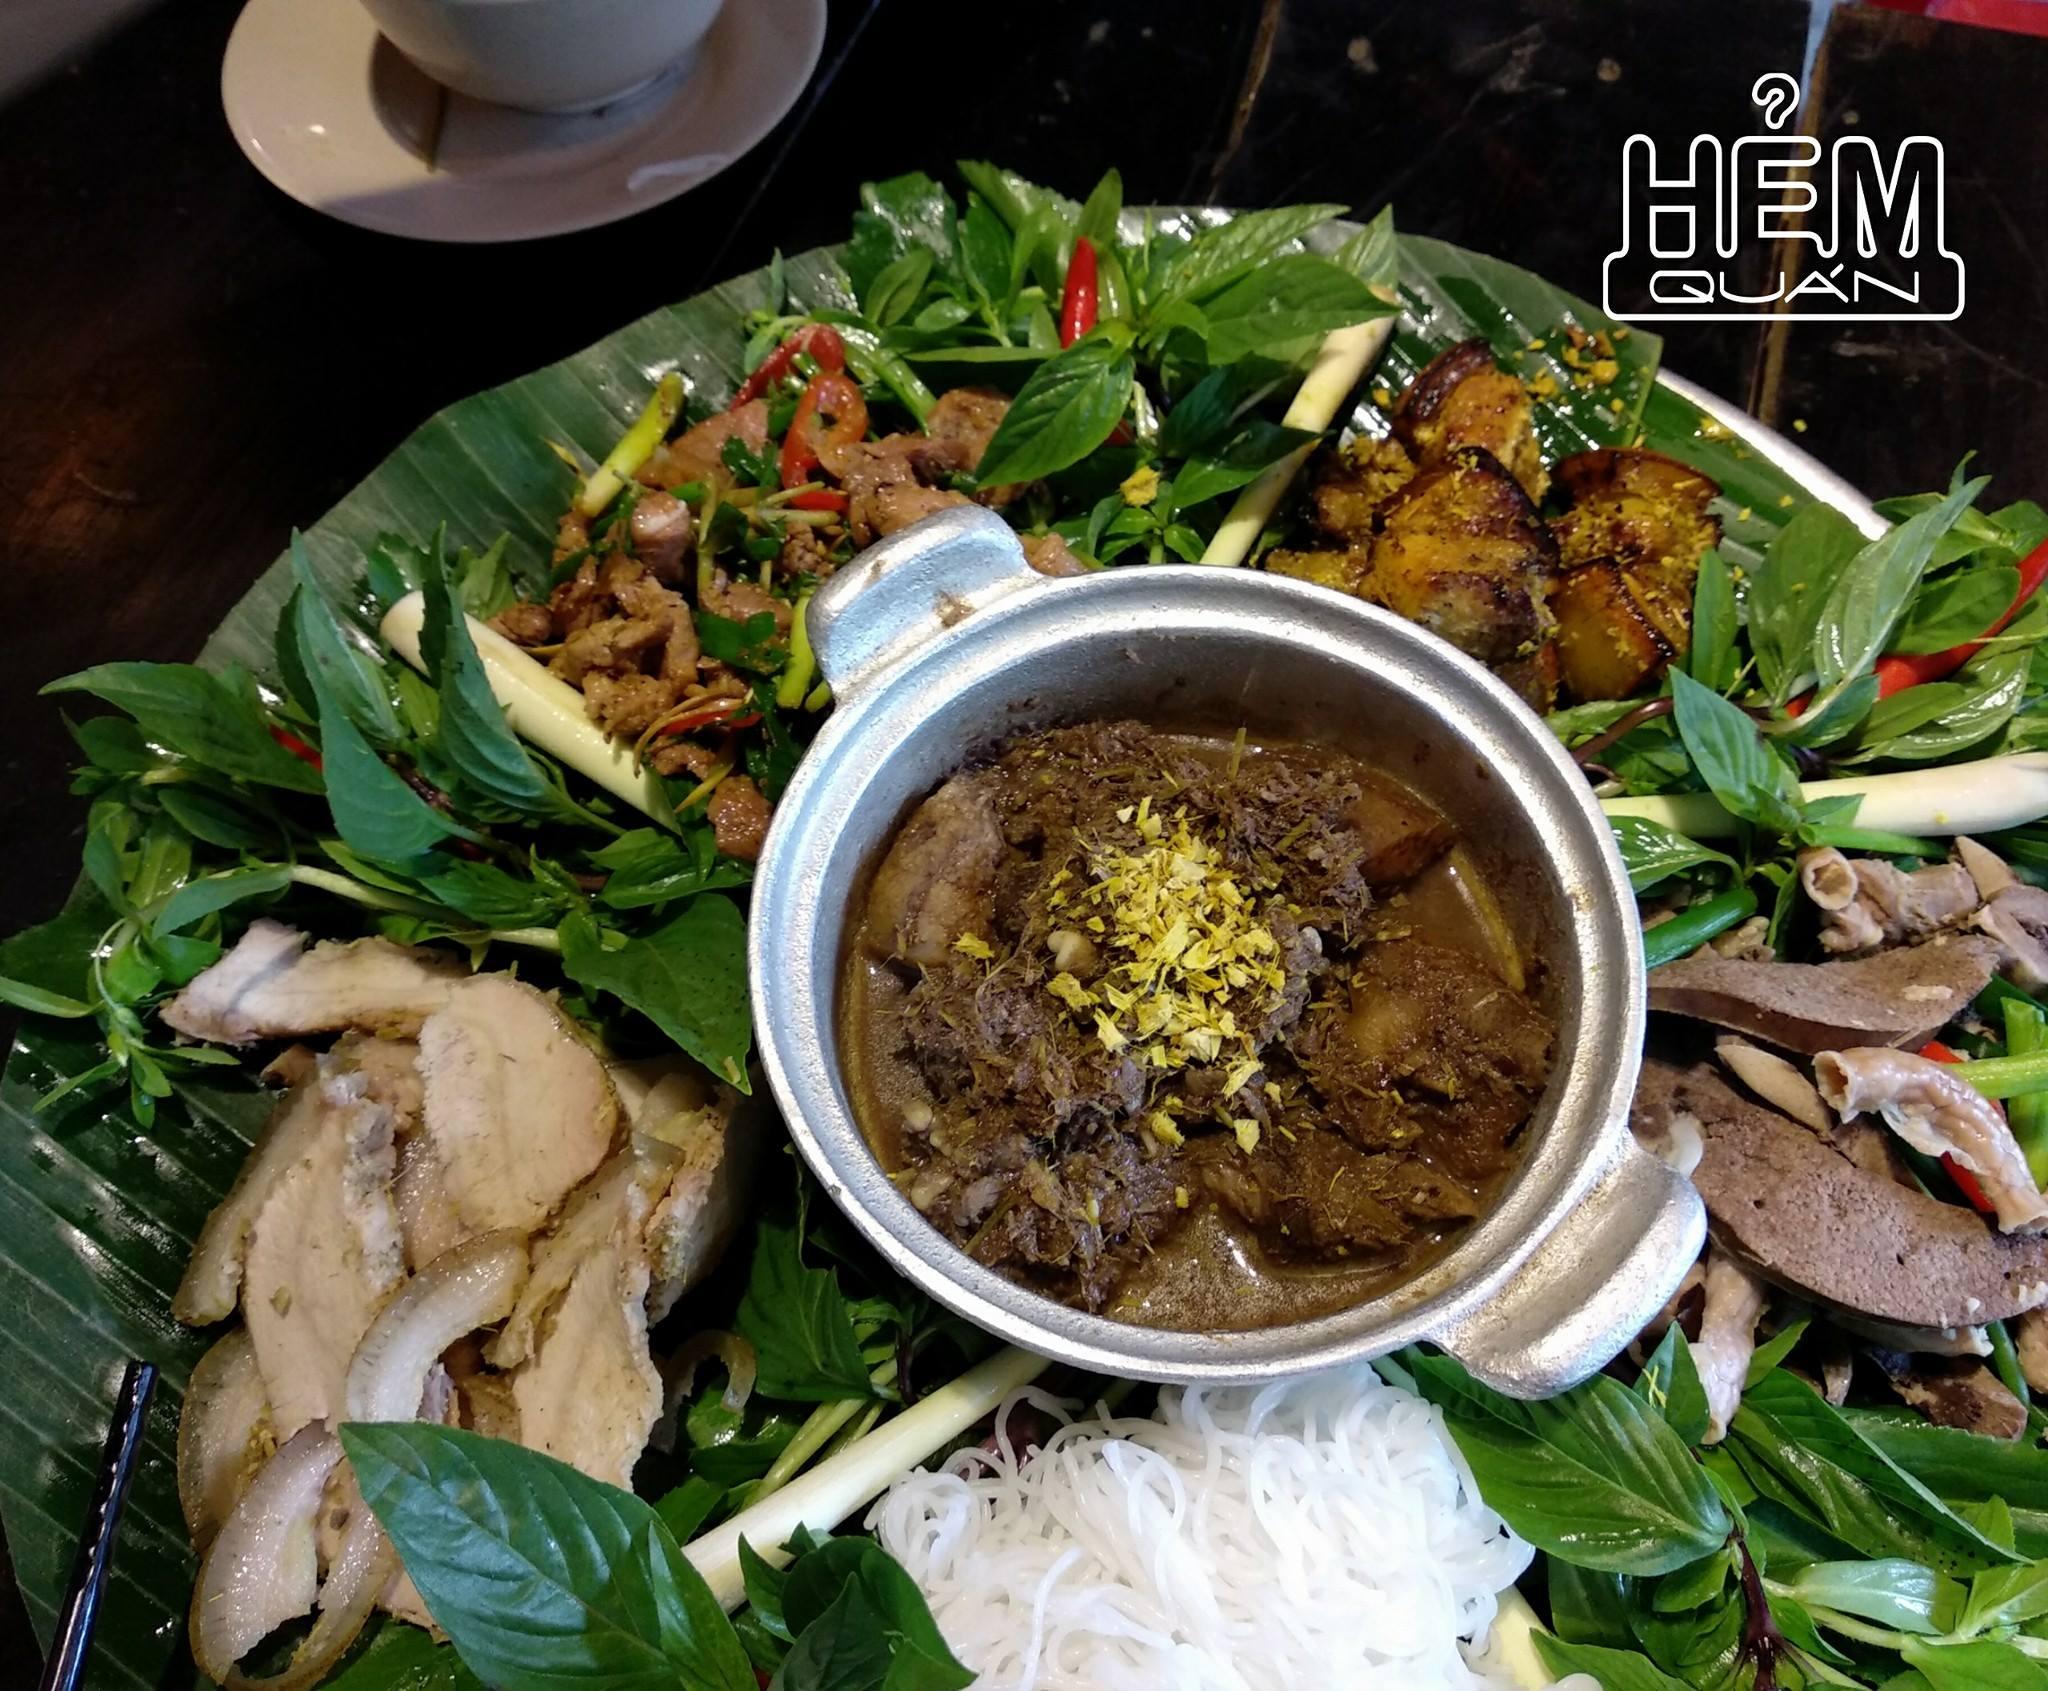 Hẻm Quán menu